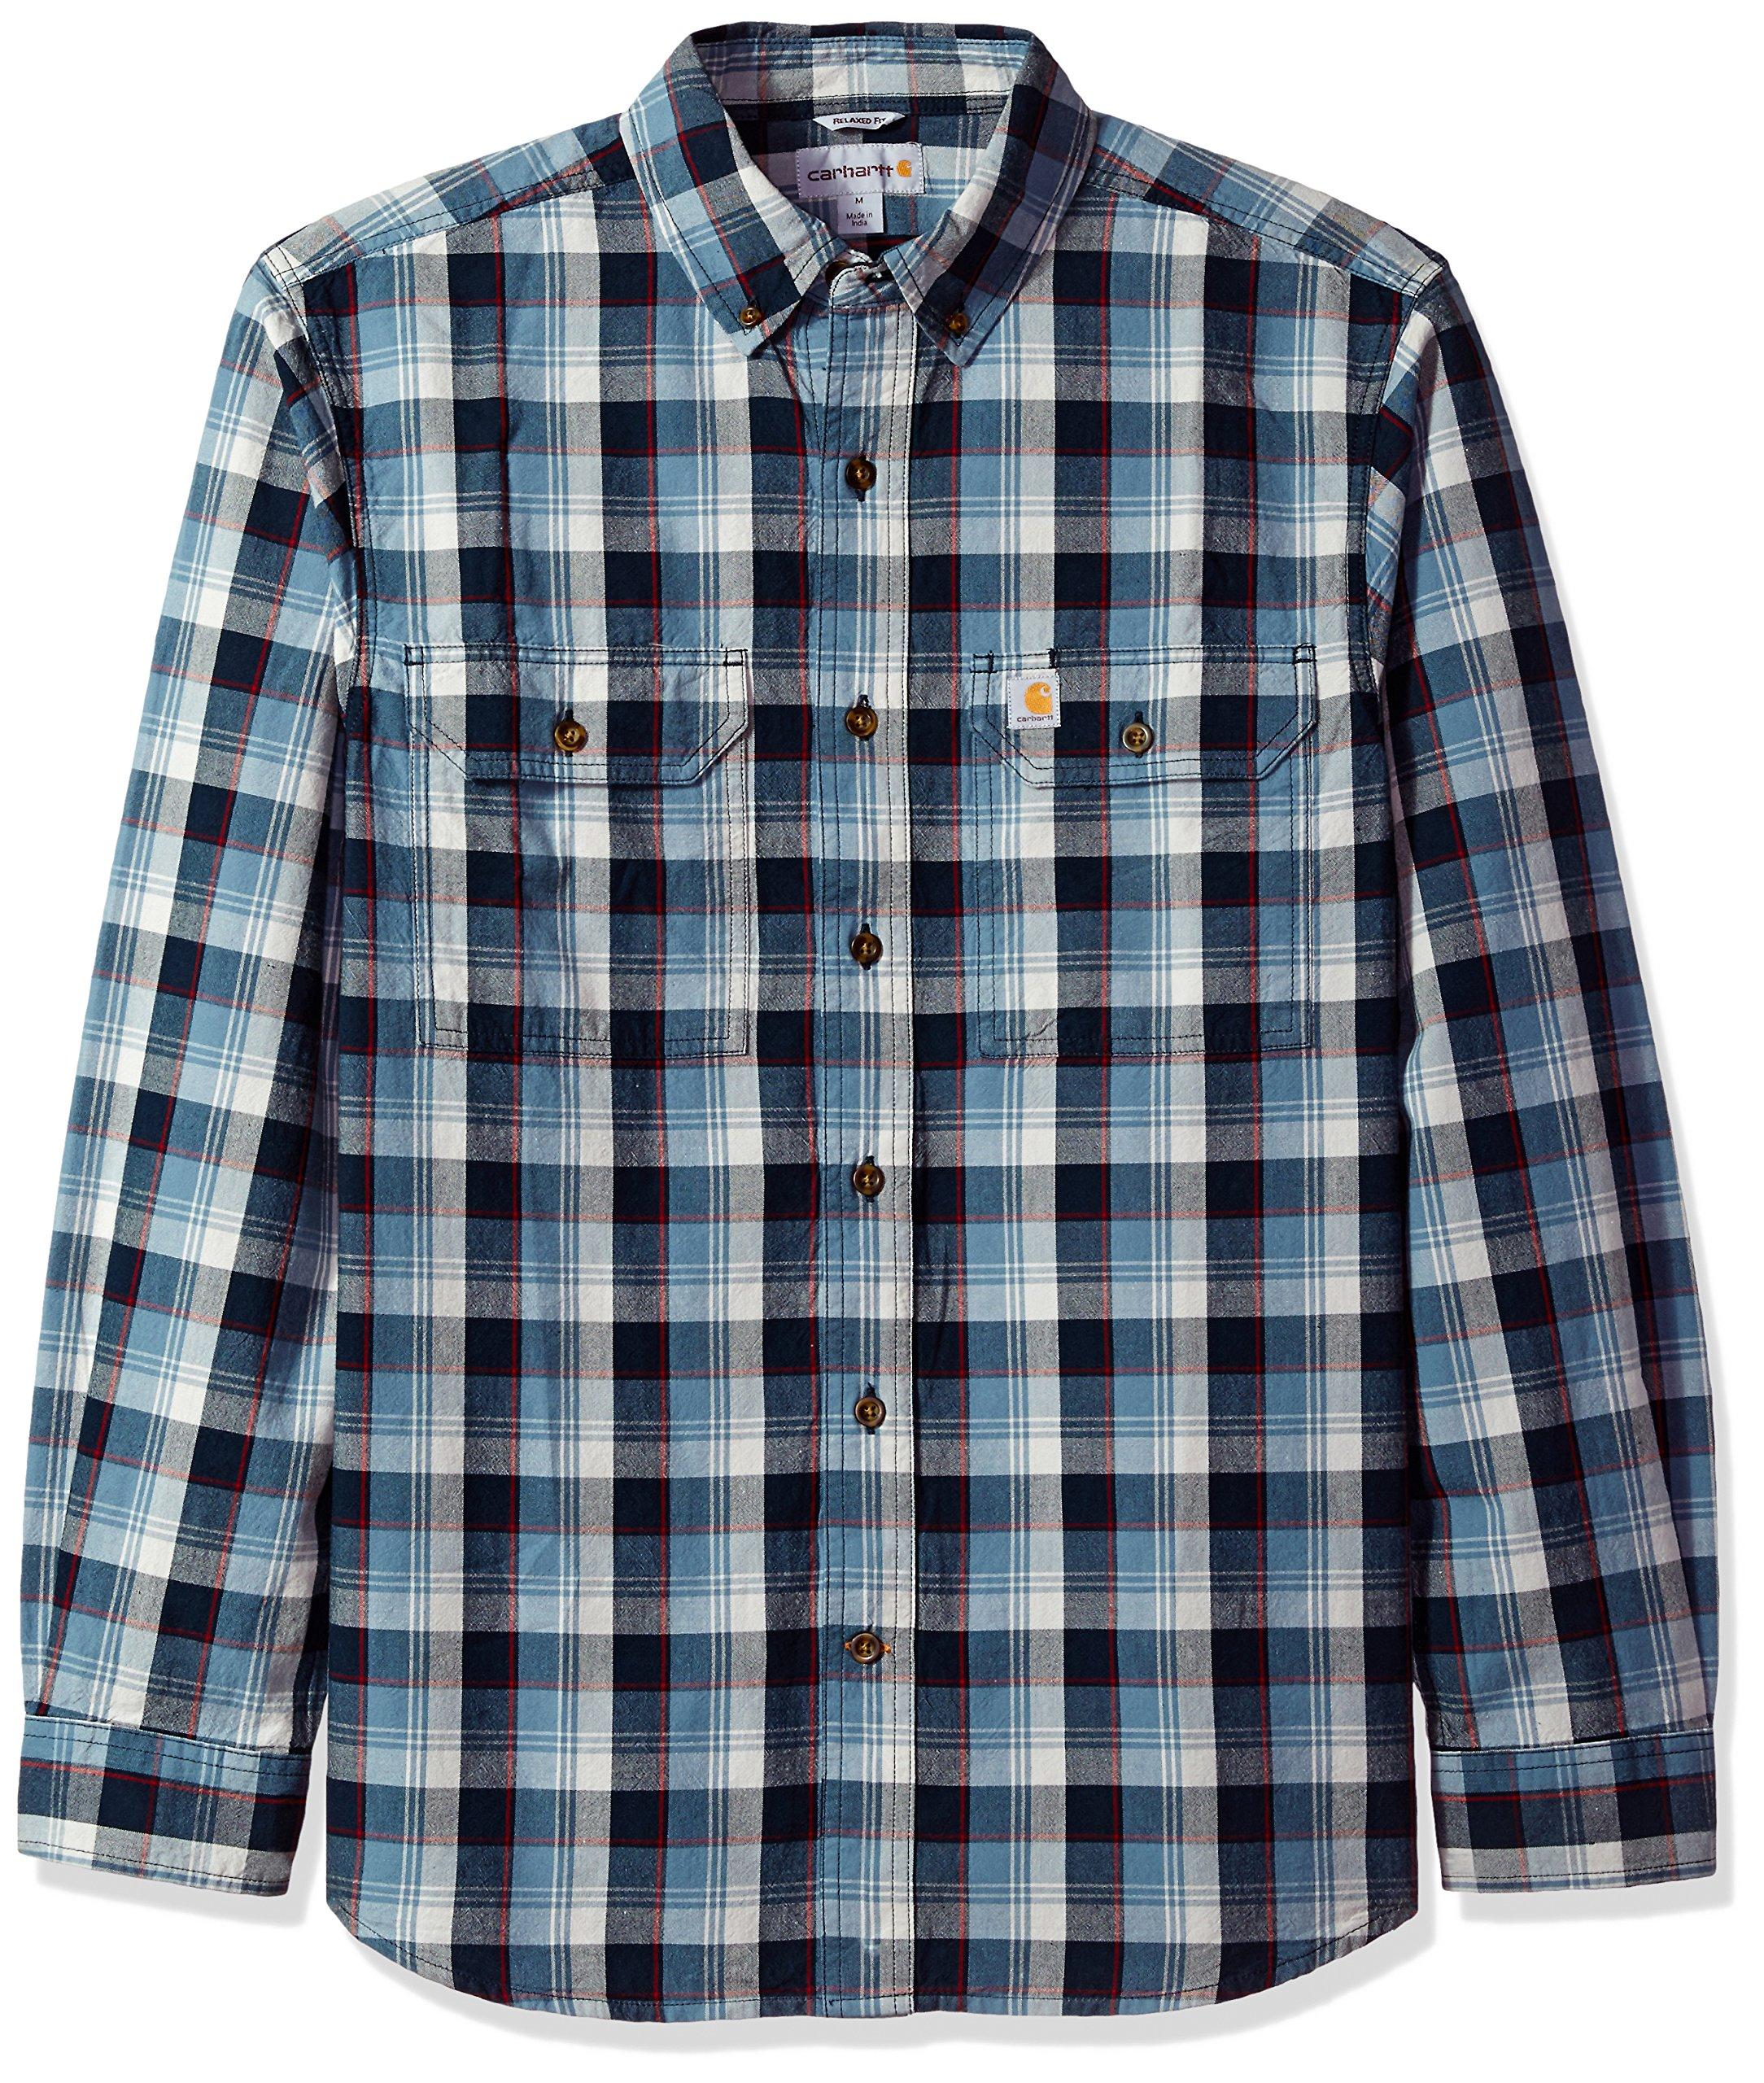 Carhartt Men's Fort Plaid Long Sleeve Shirt, Steel Blue, Large by Carhartt (Image #1)